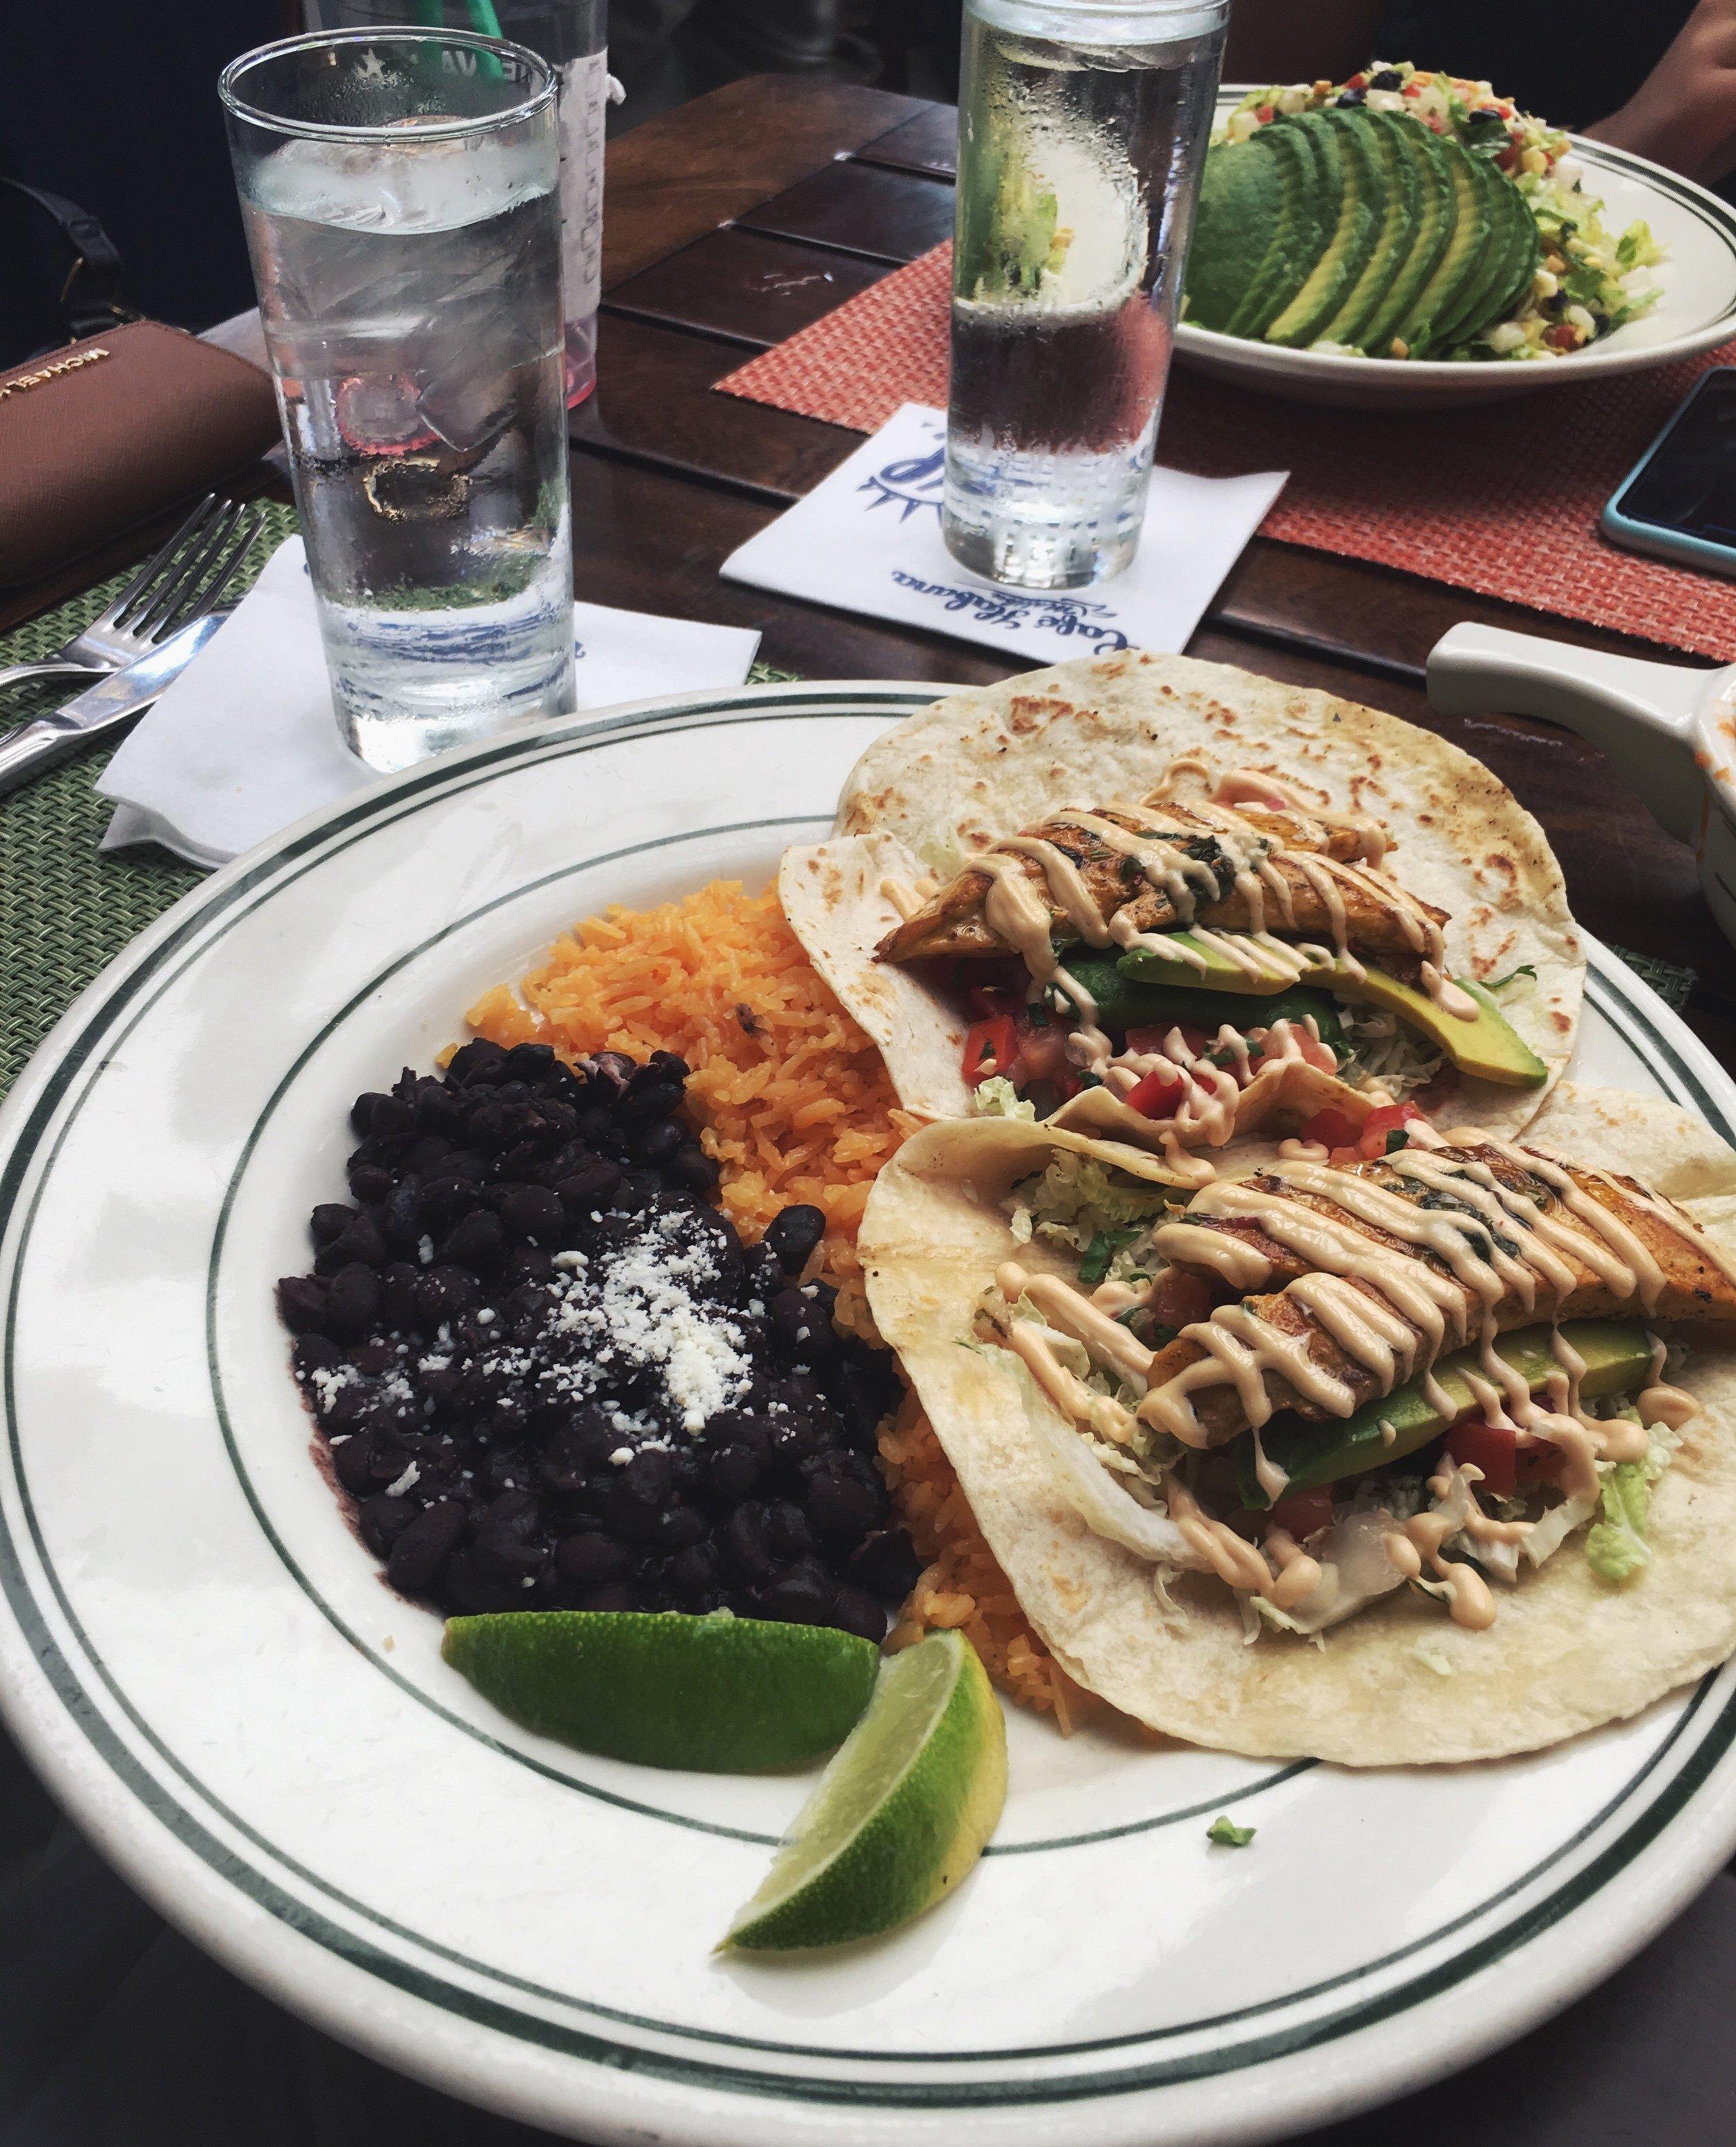 Pictured above: Mexican chicken fajitas at Bartaco